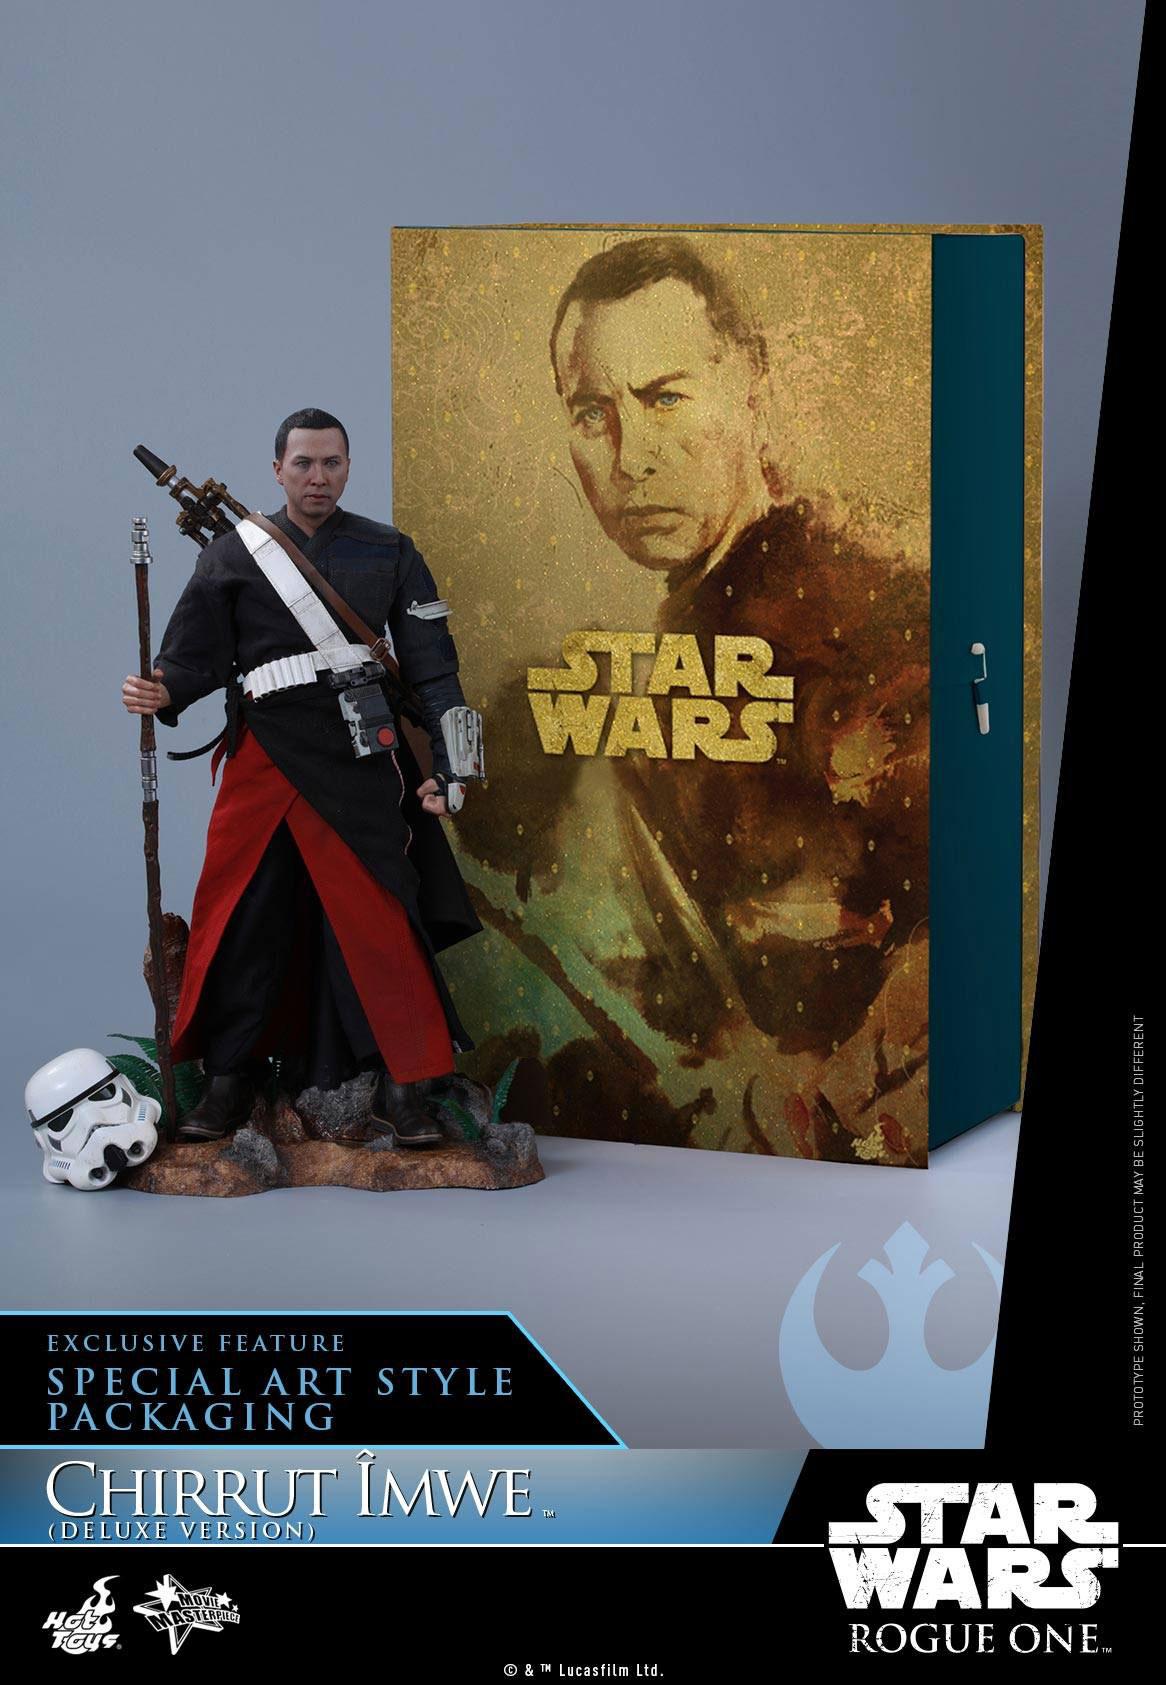 Hot-Toys-Star-Wars-Rogue-One-Chirrut-Imwe-figure-6